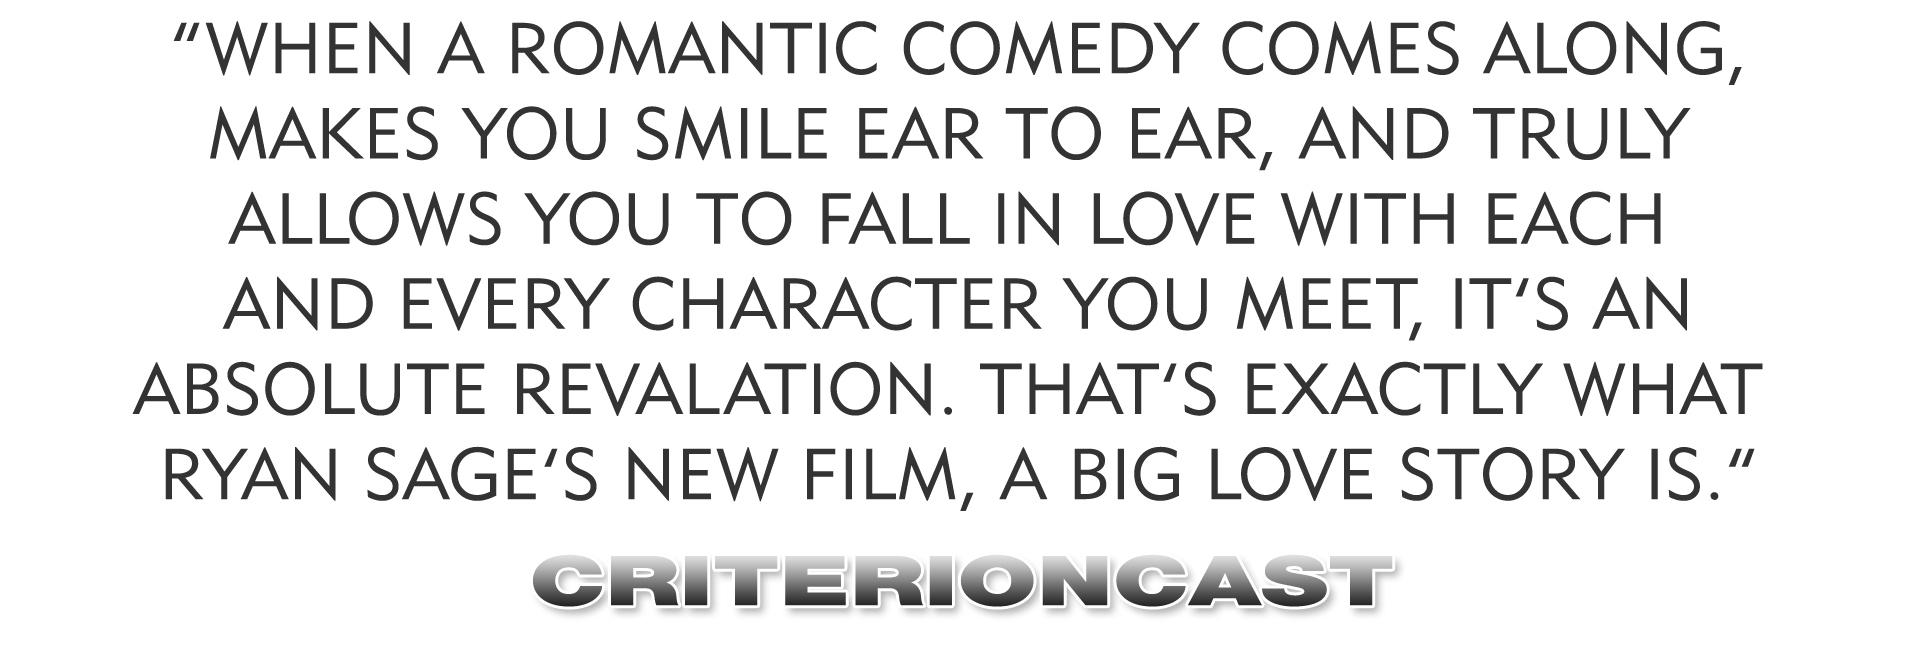 Criterioncast3.jpg